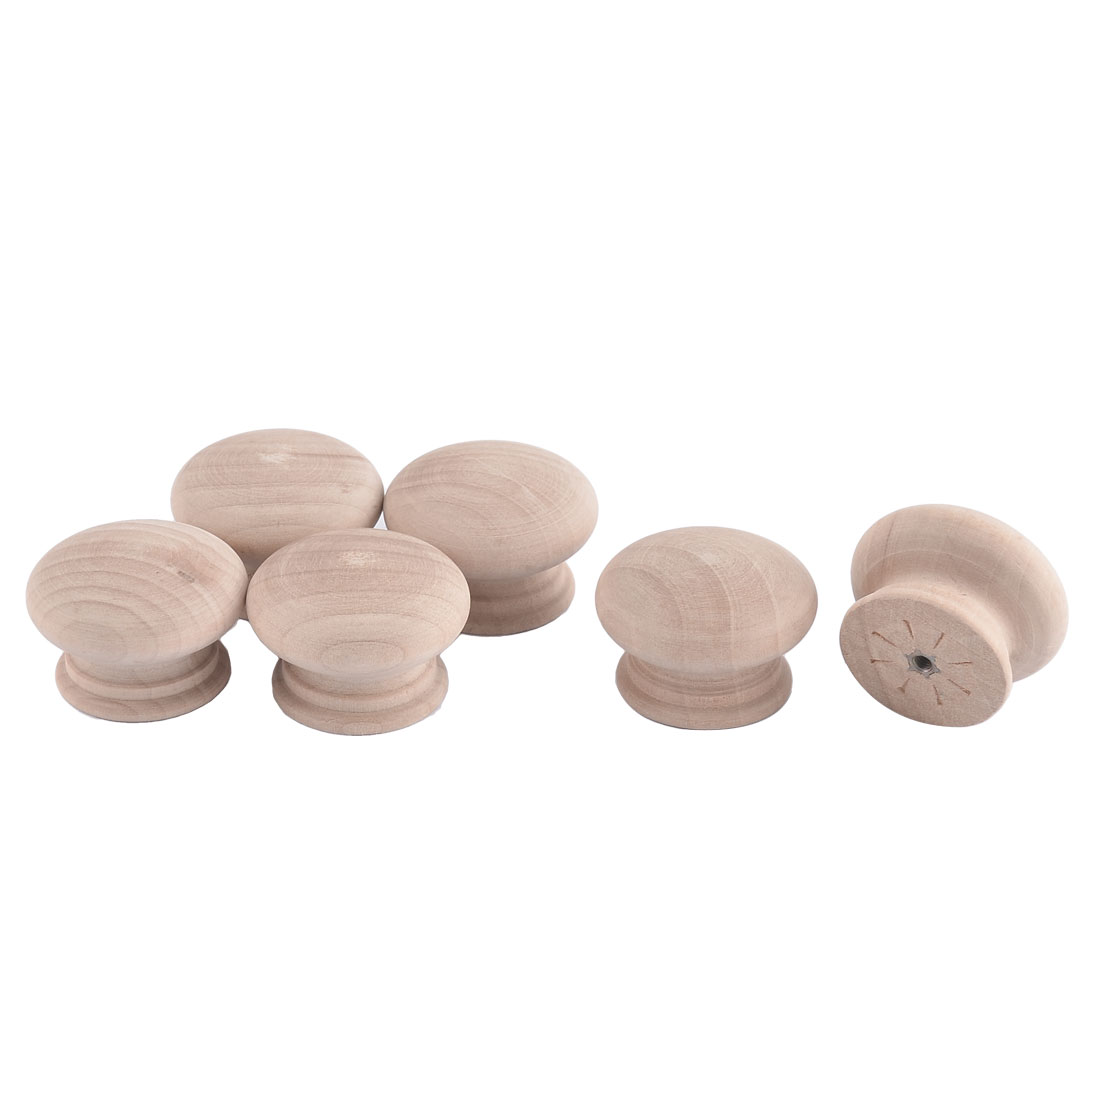 45mm Dia Round Cabinet Drawer Cupboard Closet Door Handle Wooden Pull Knob 6pcs